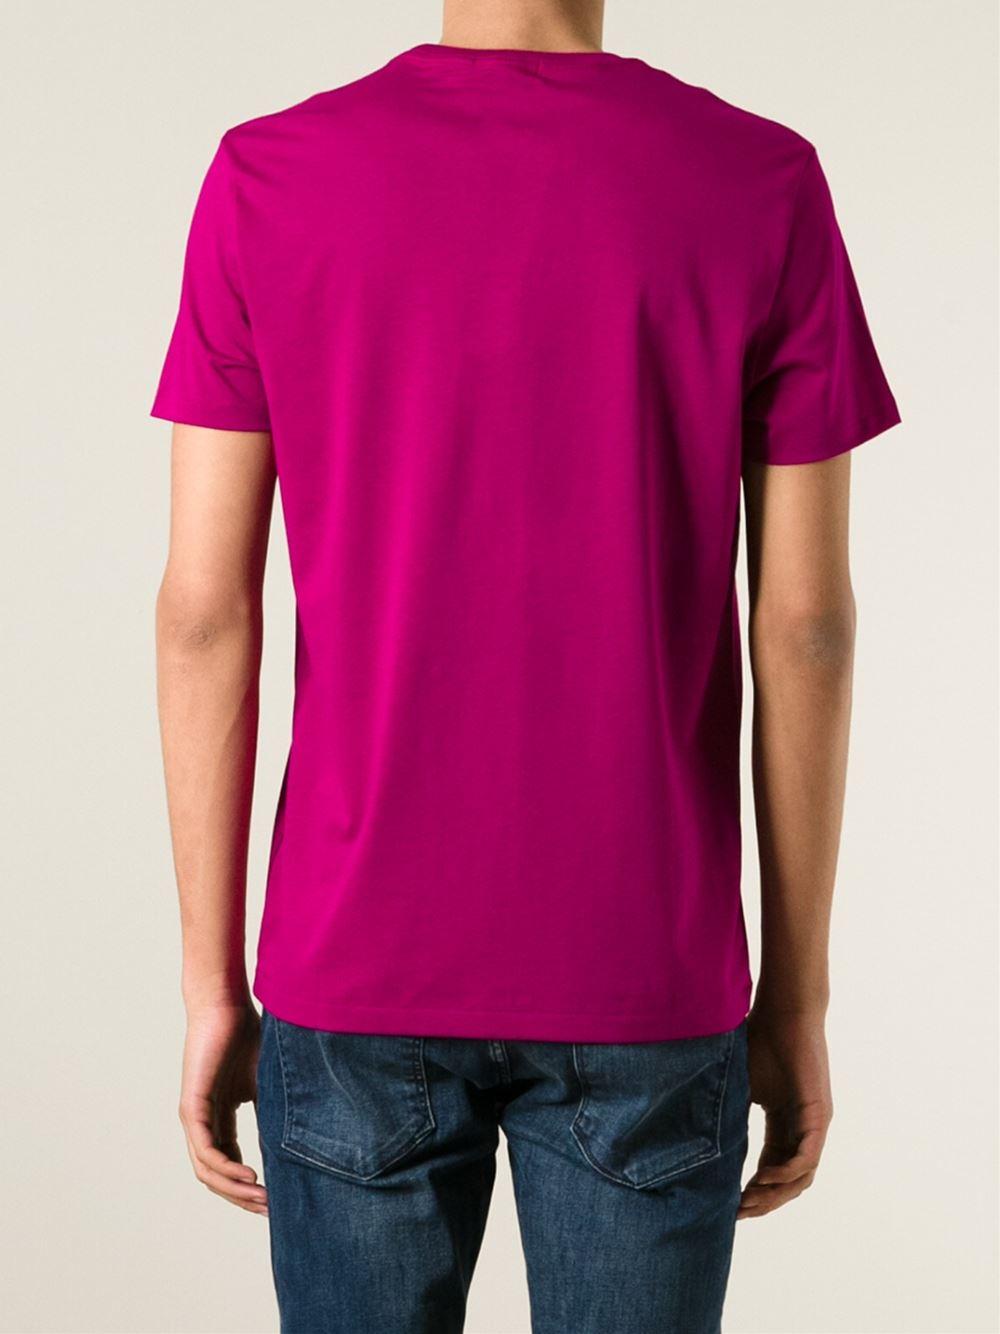 b567856d4f72 Burberry Brit Plaid Shirts Pink